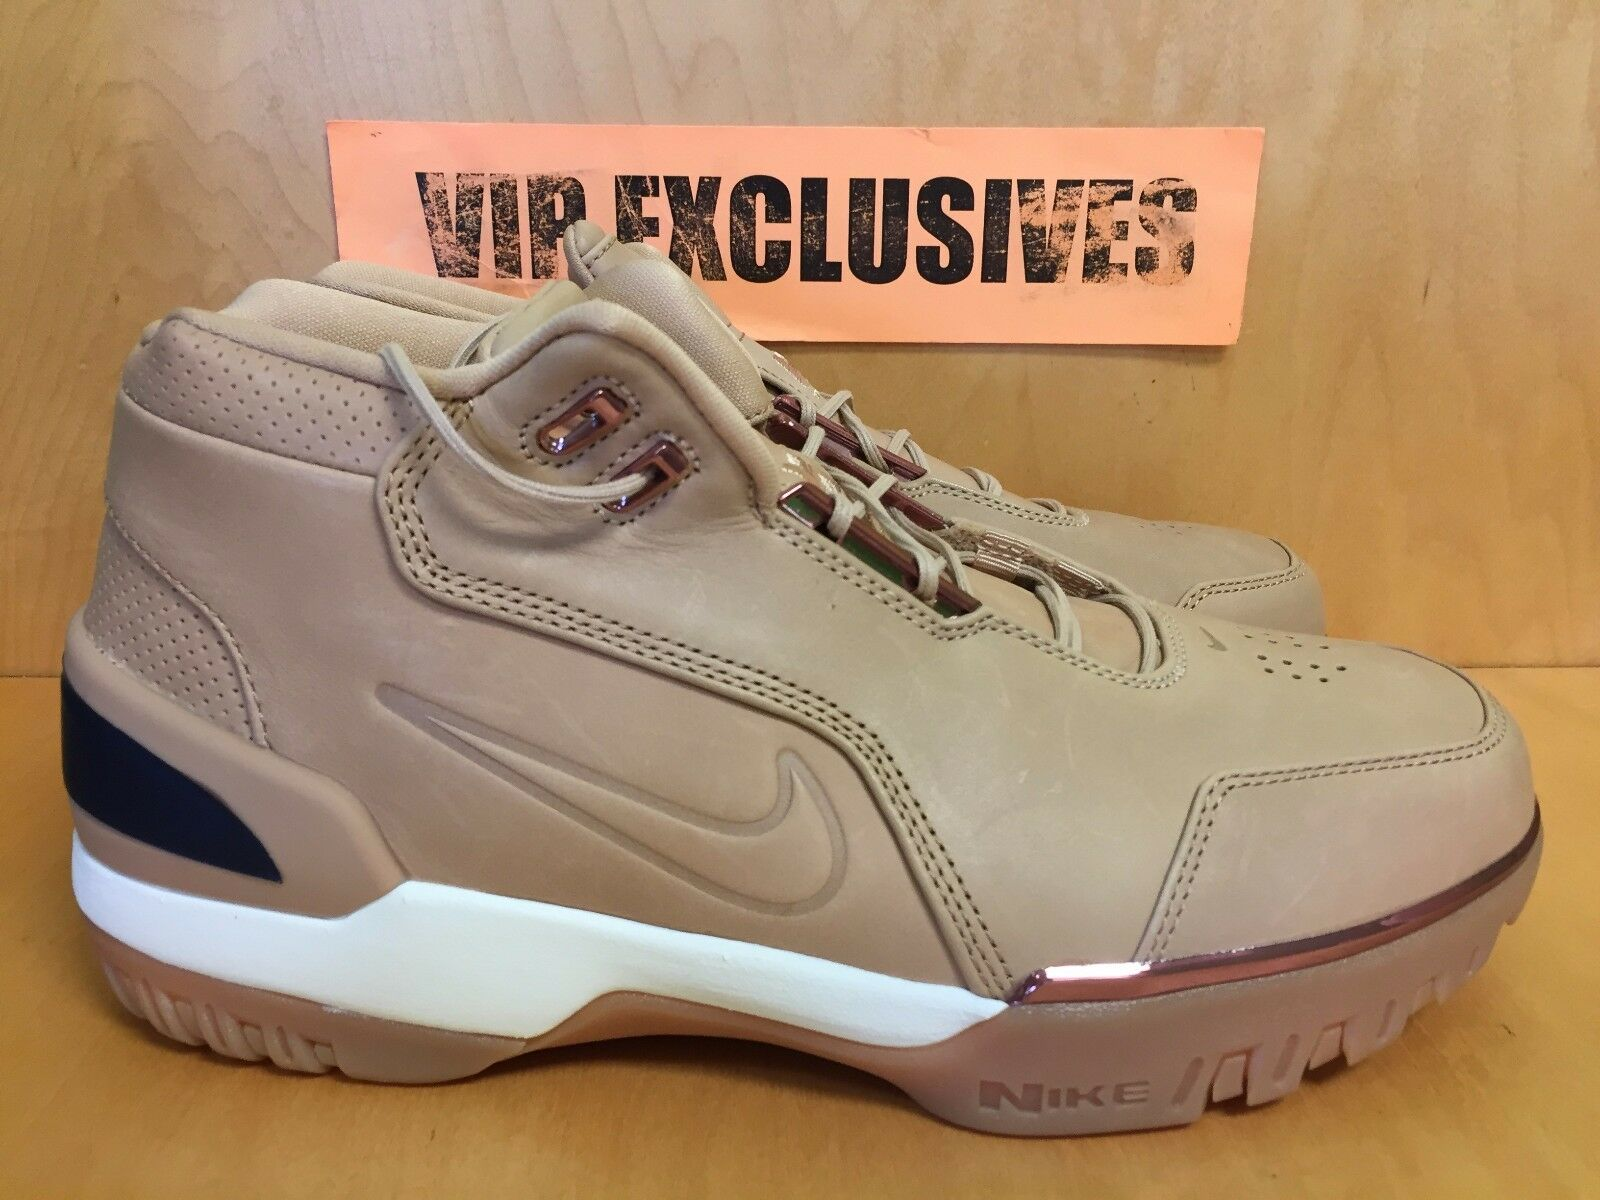 Nike air zoom generazione come qs vachetta tan lebron all star 308214-200 limited